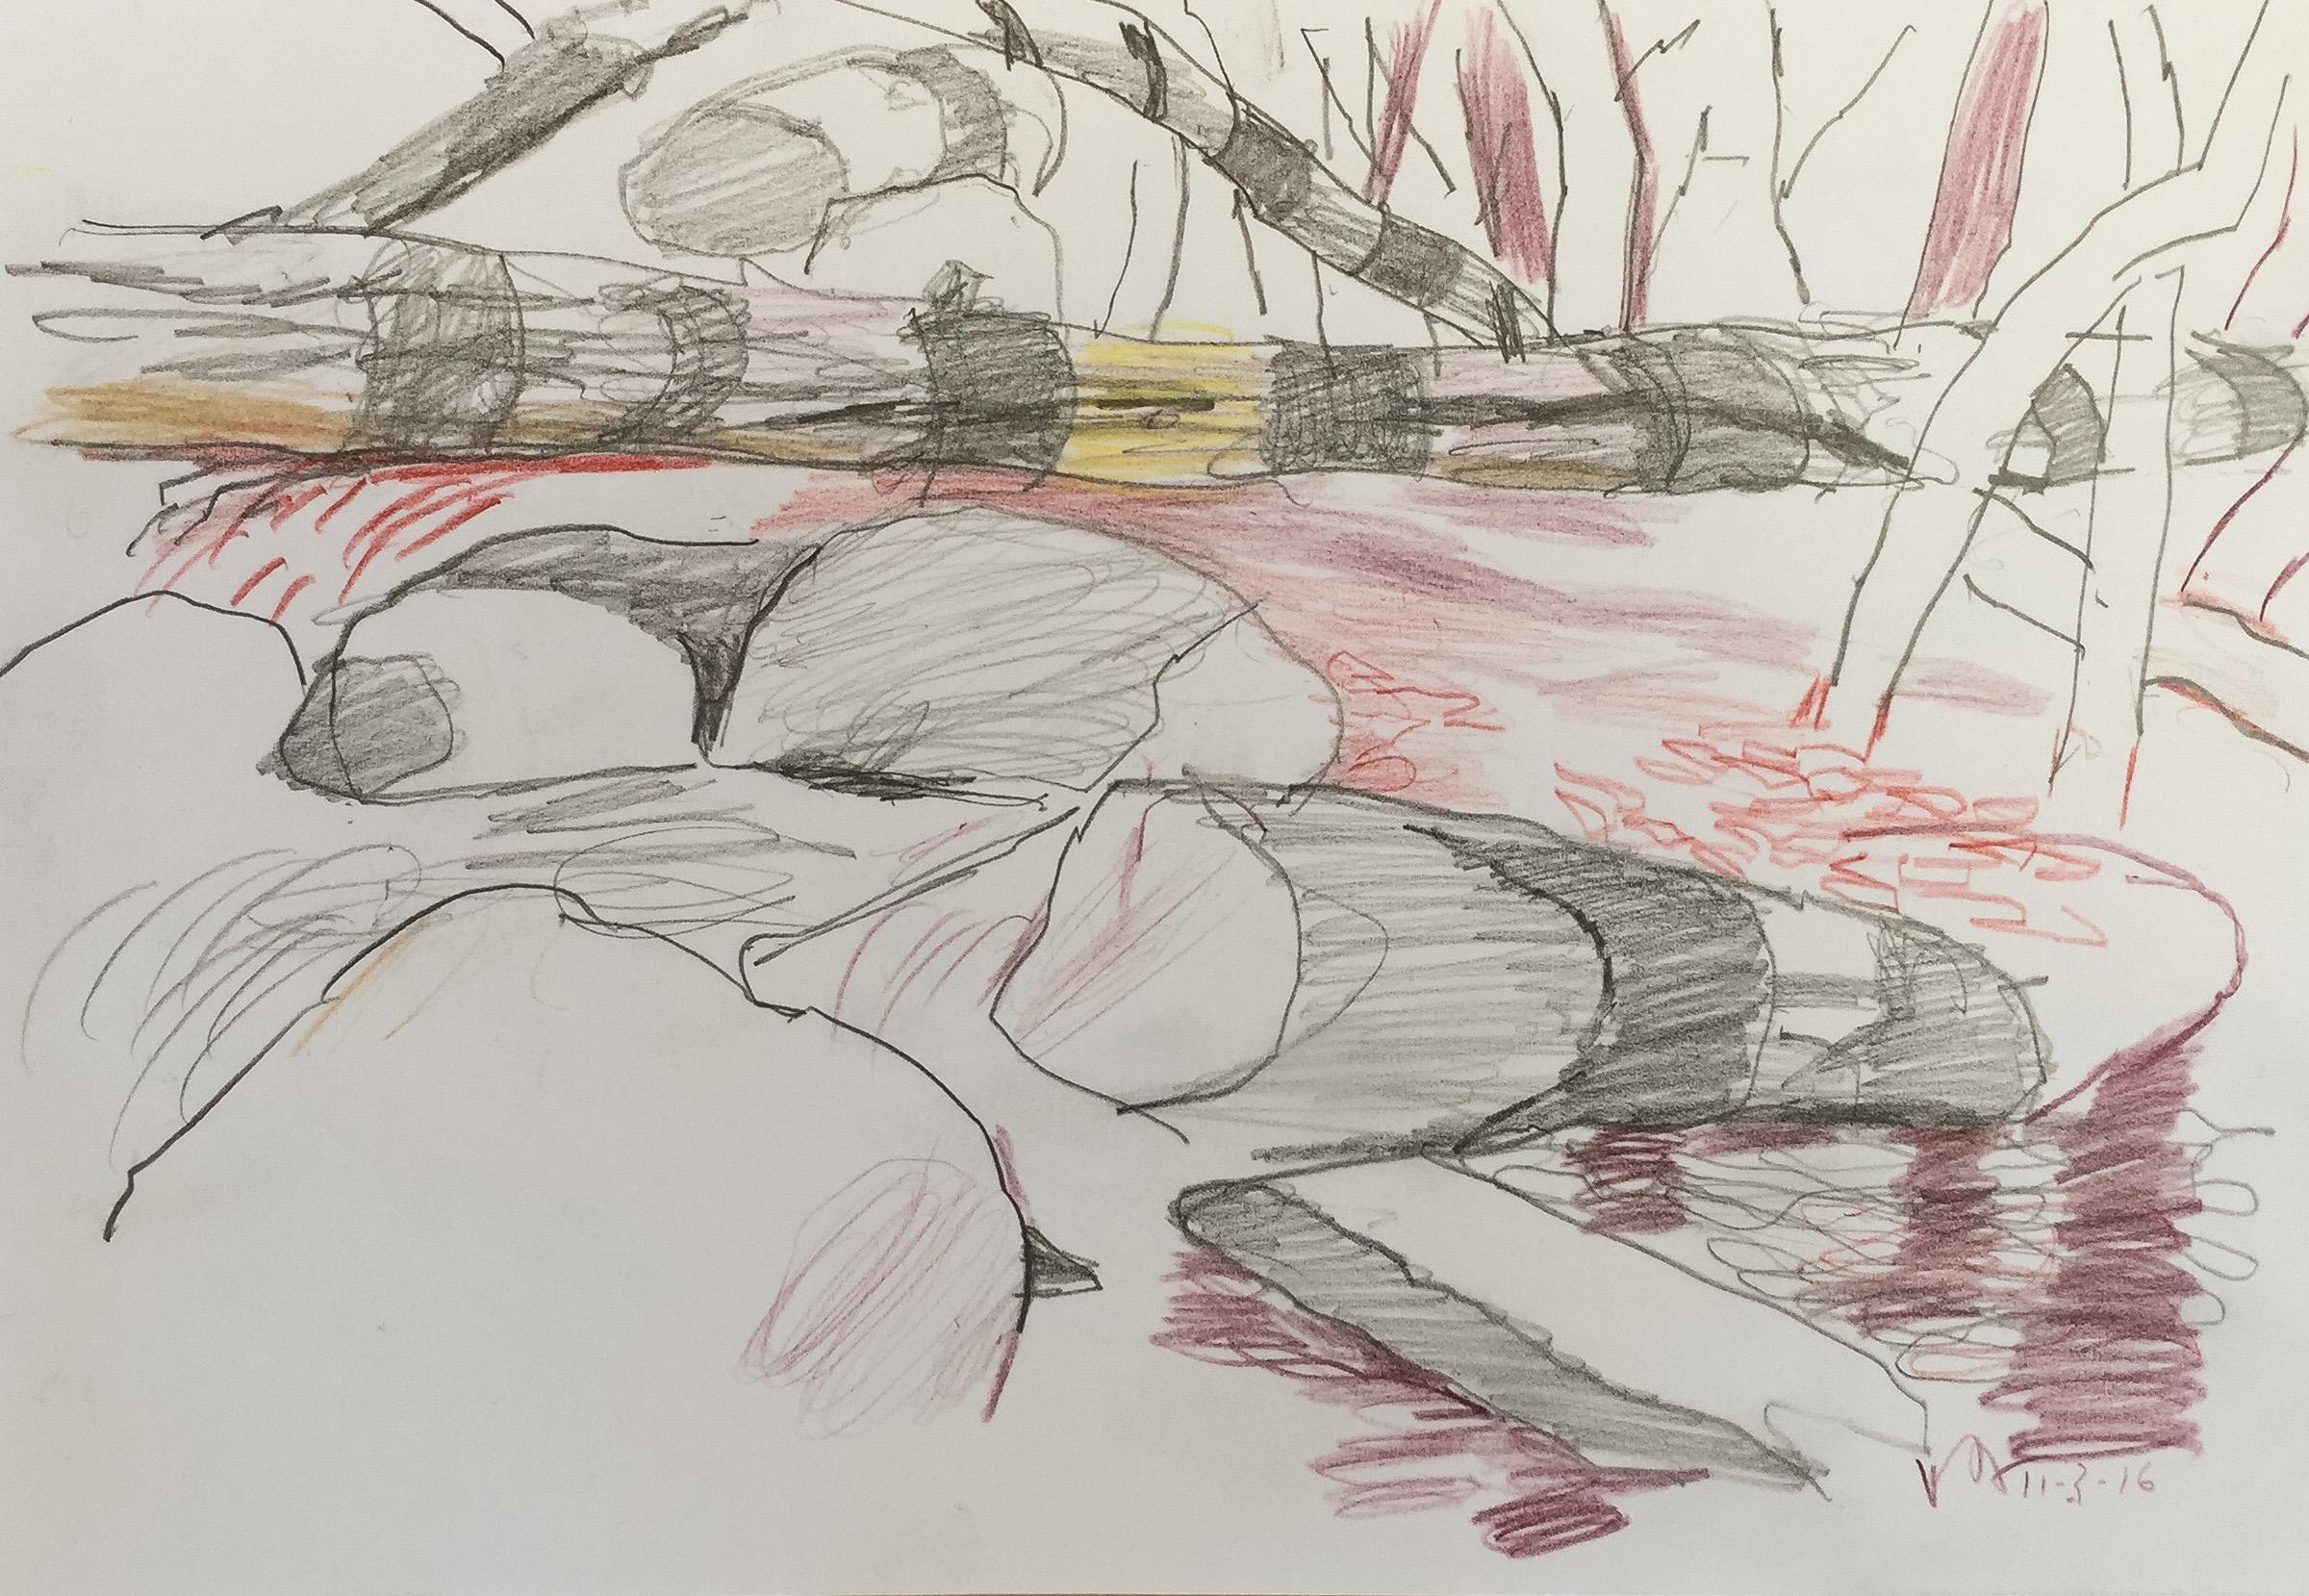 11-3-16 creek drawing